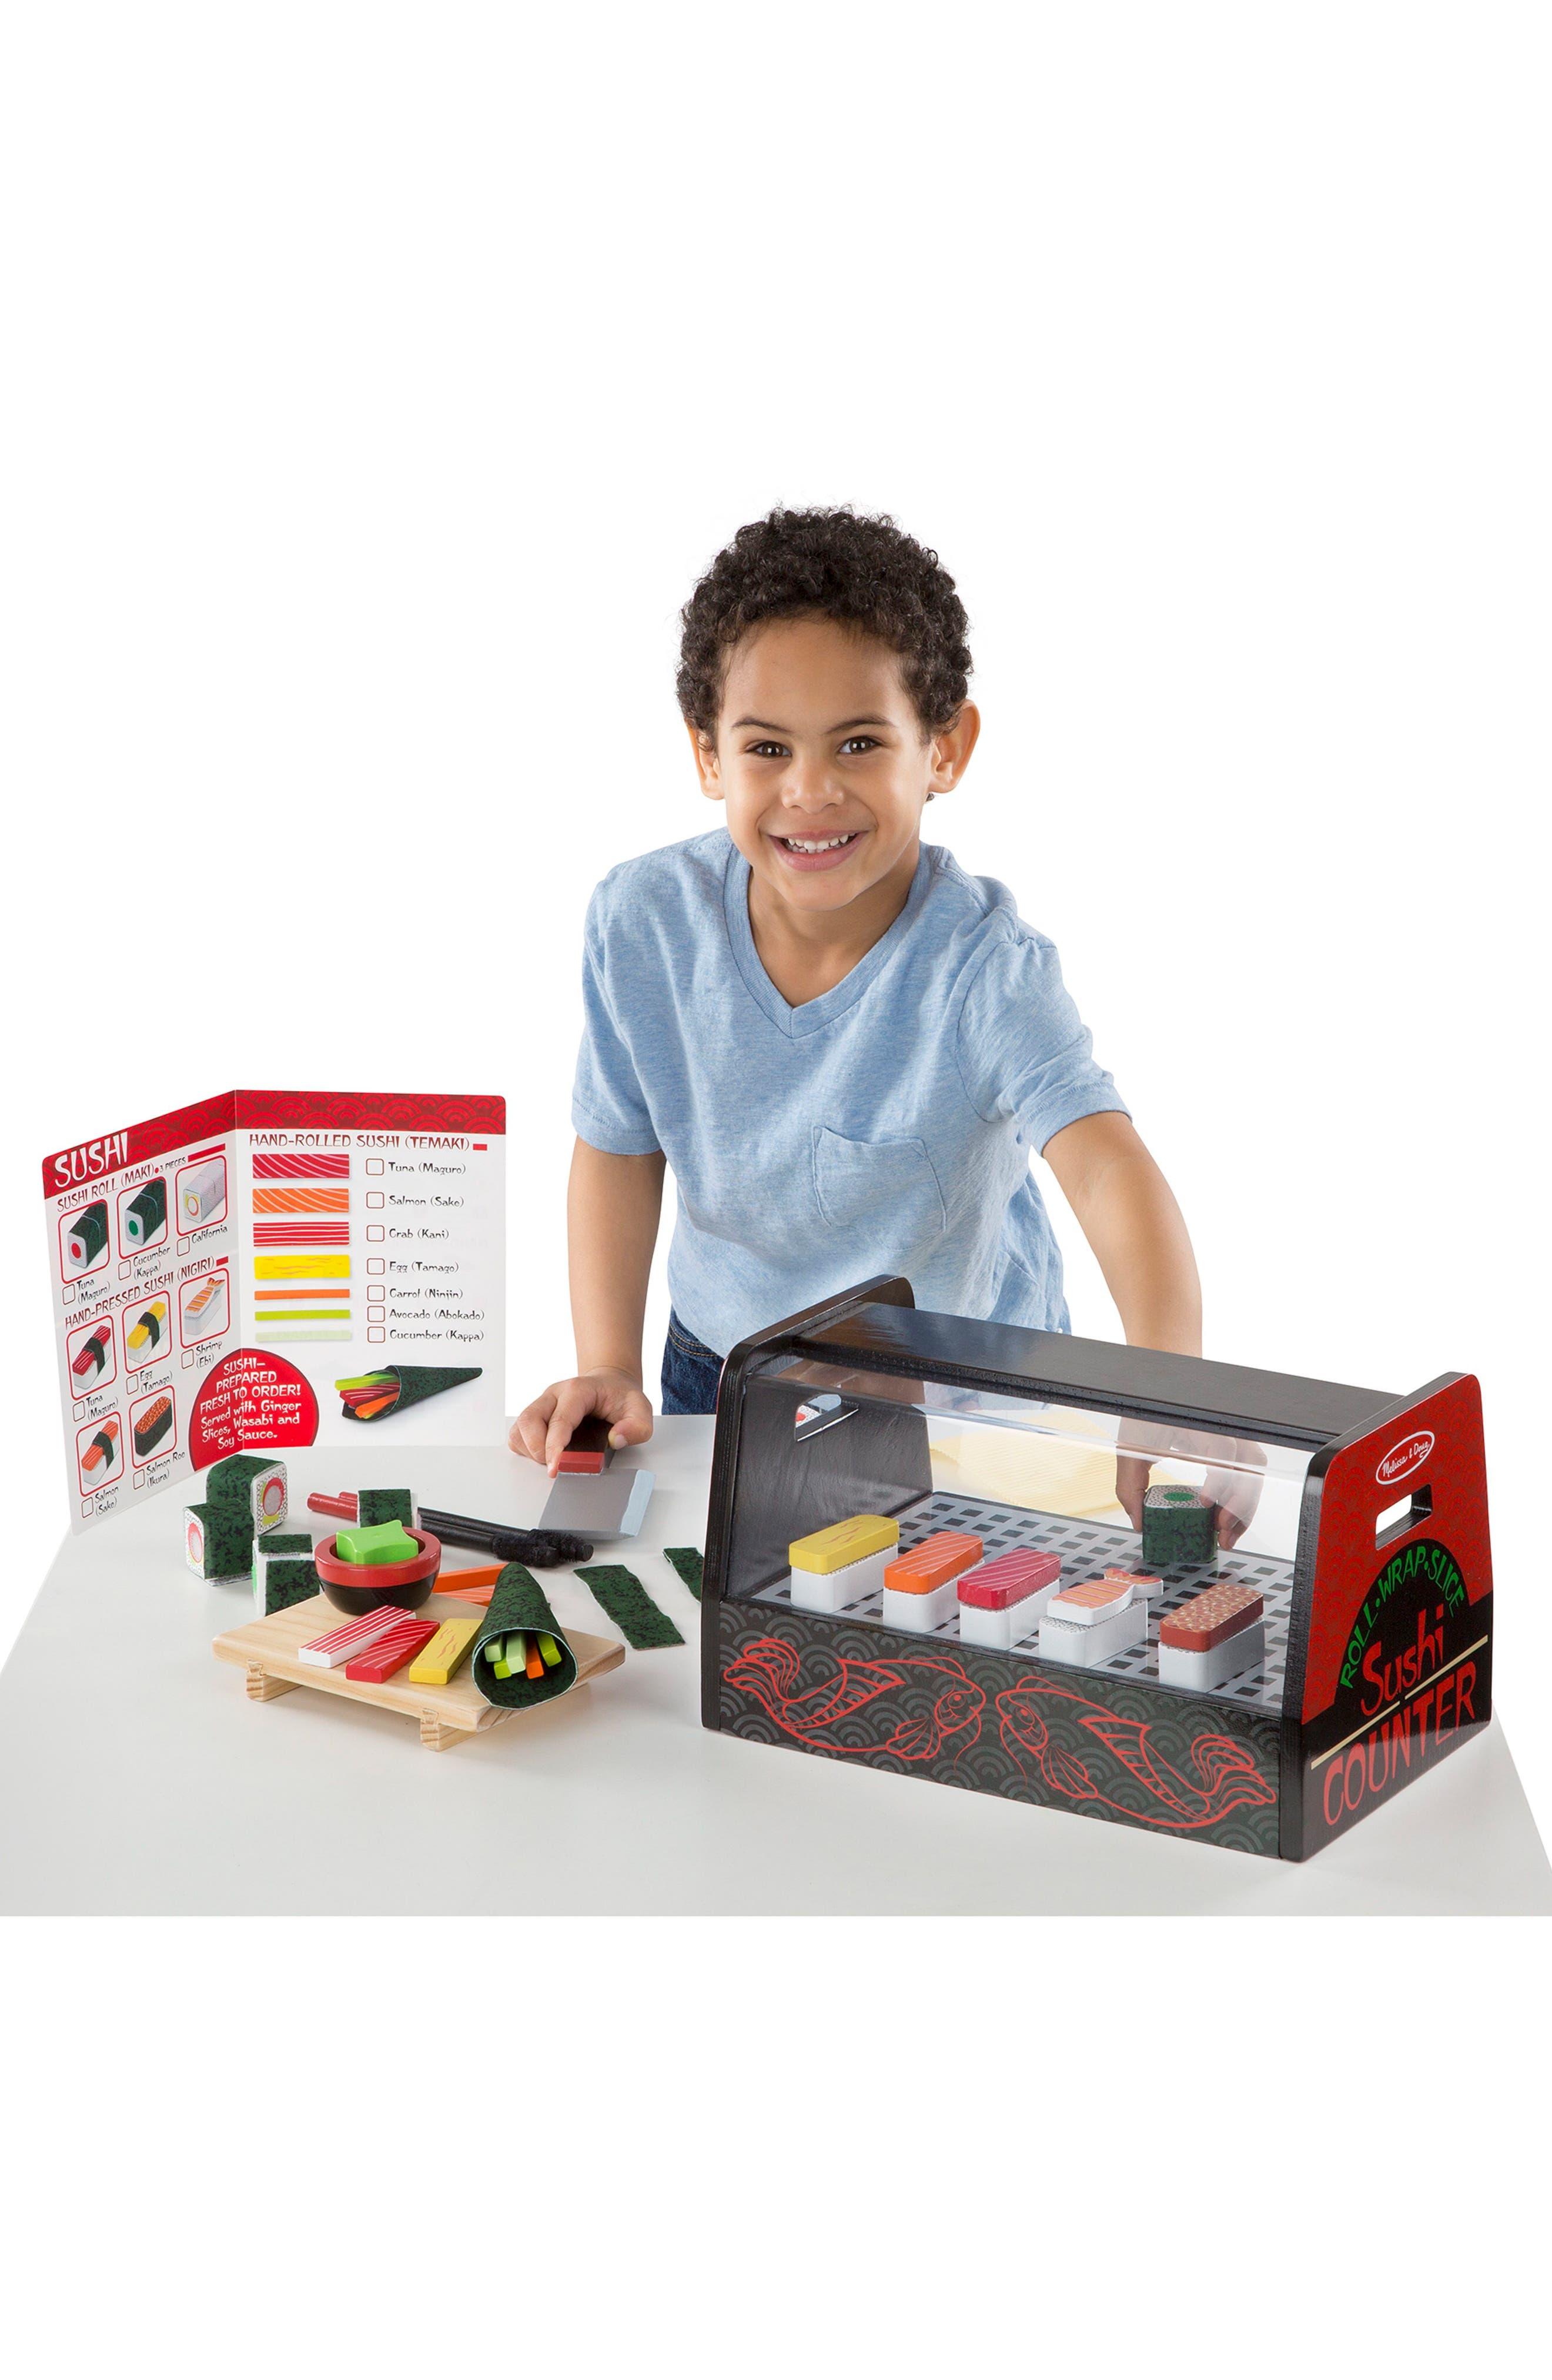 46-Piece Roll Wrap Slice Sushi Making Play Set,                             Alternate thumbnail 8, color,                             MULTI